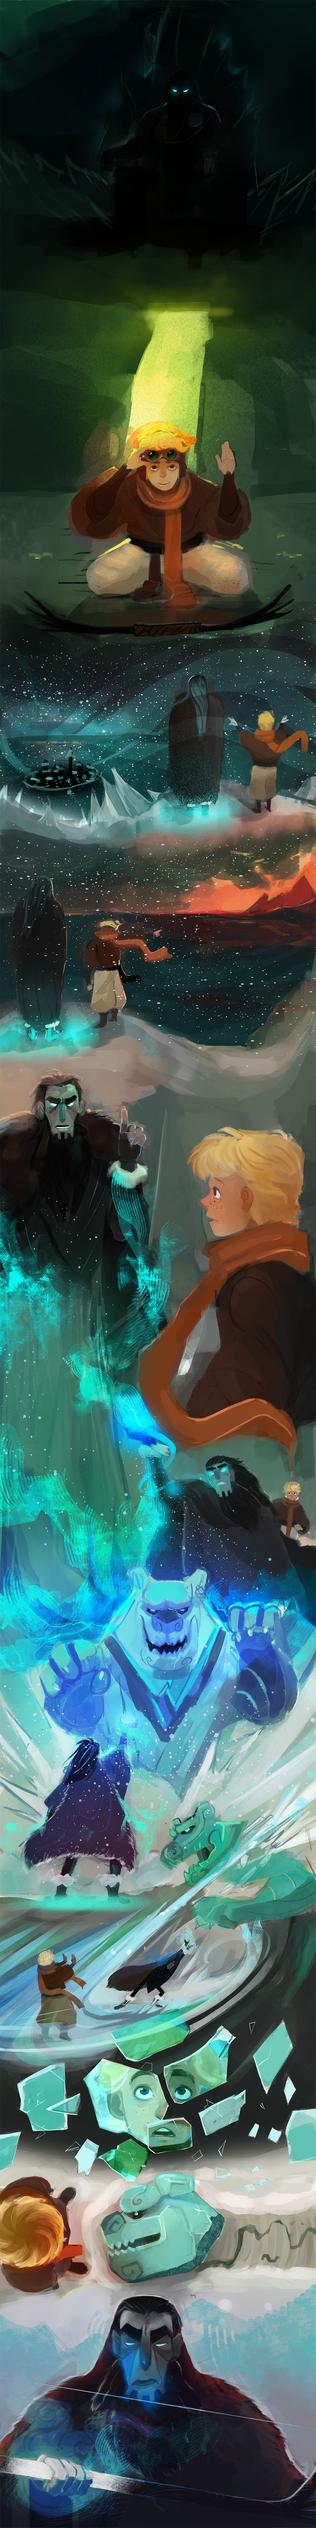 Frostblight (15) by michaeldoig